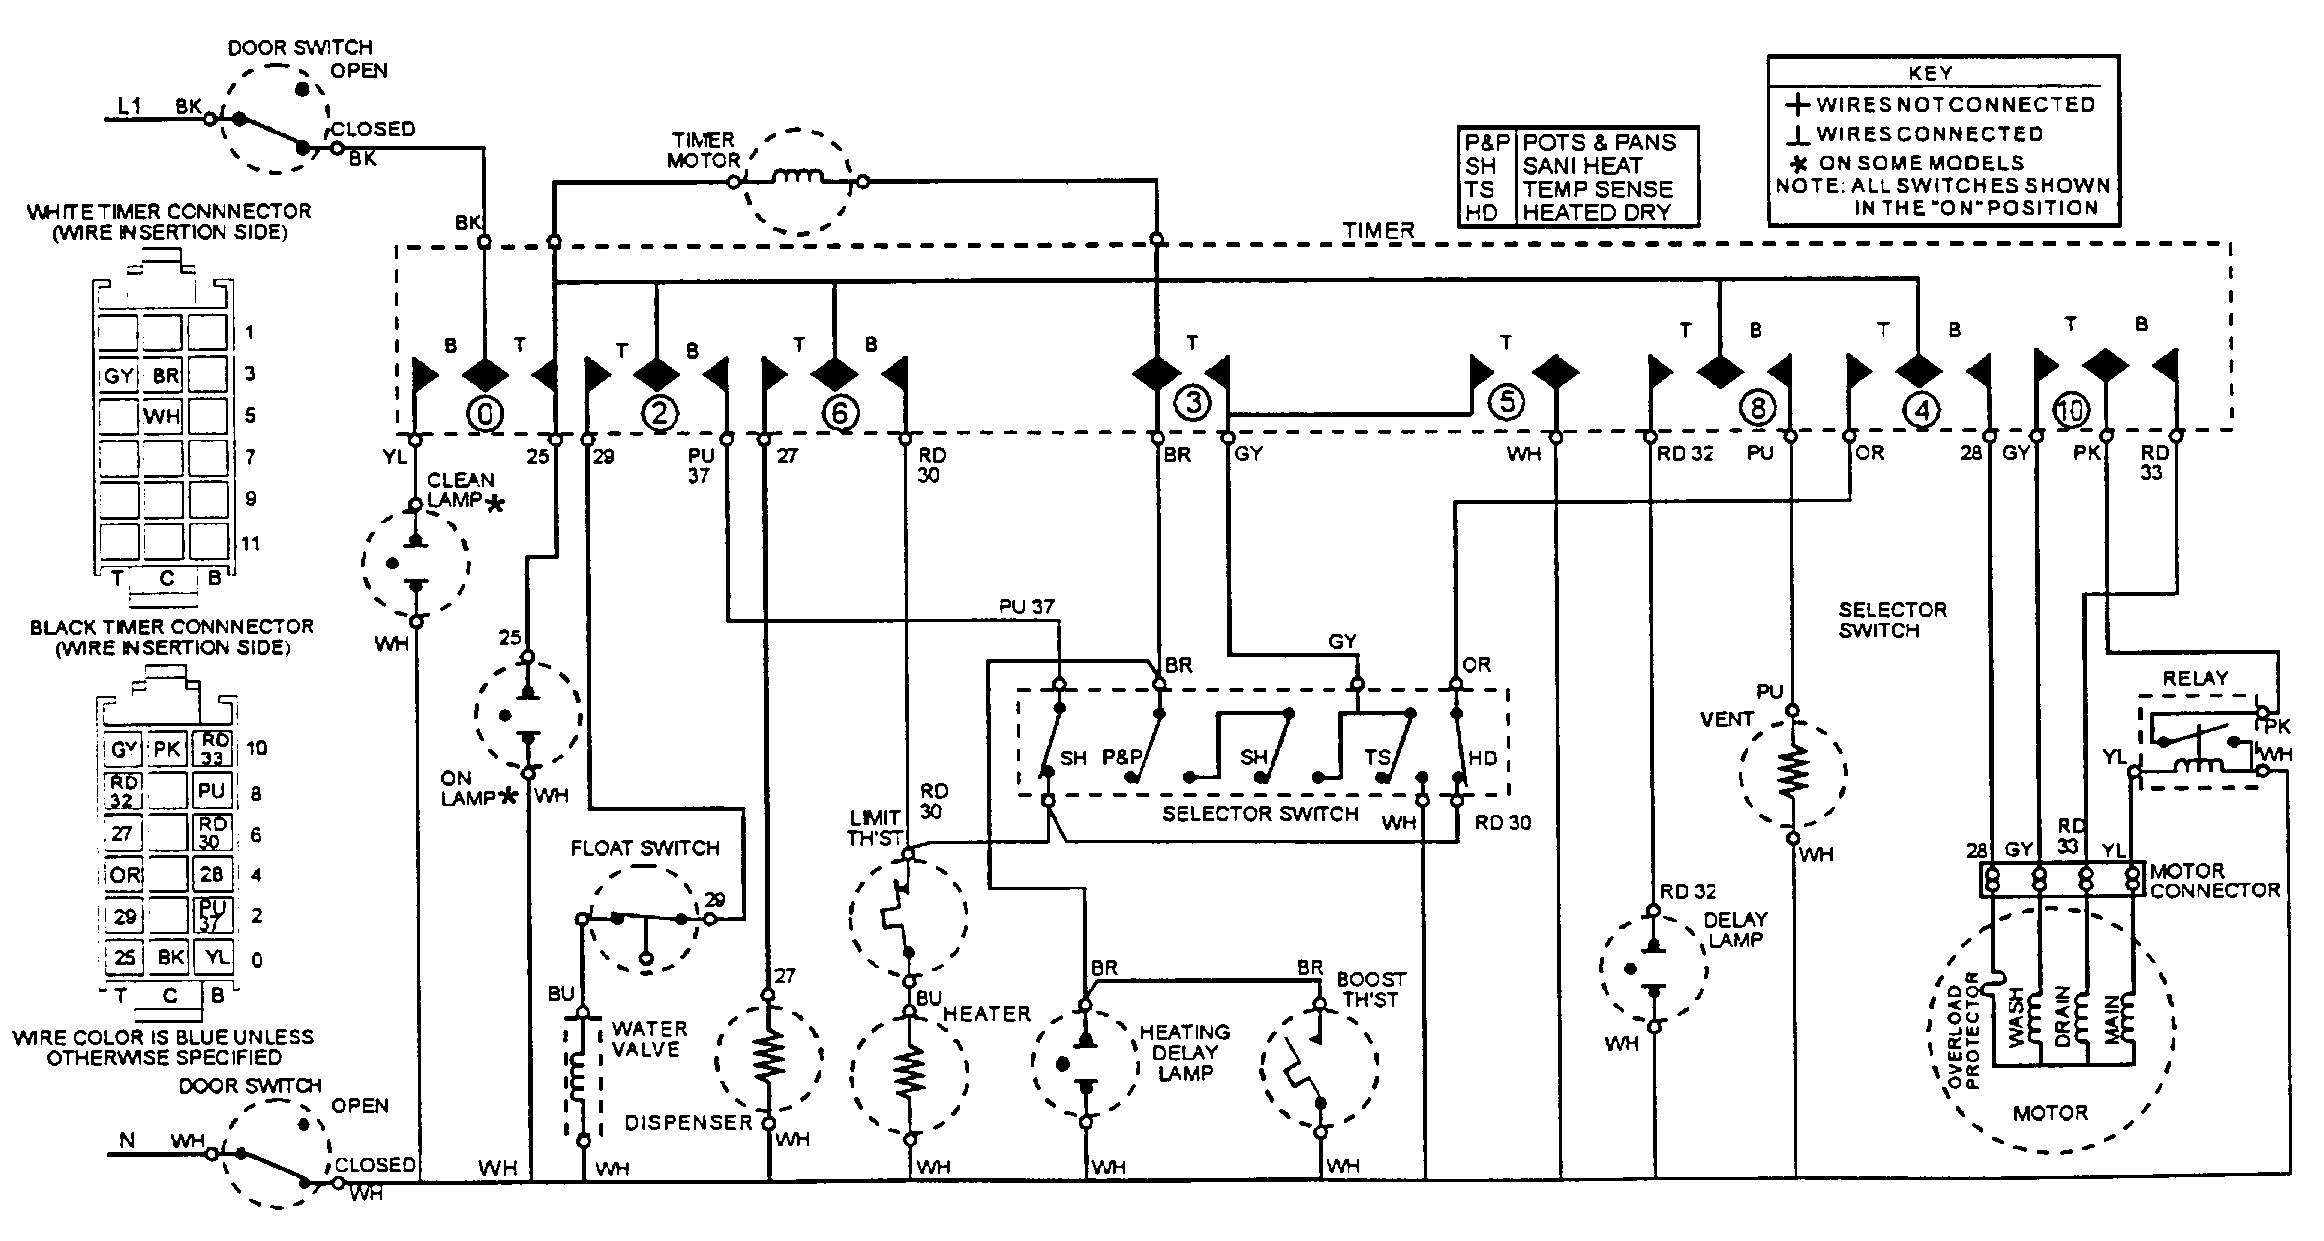 84 Ford Ranger Wiring Diagram Diagrams 1987 4x4 Spark Plug Auto Radio